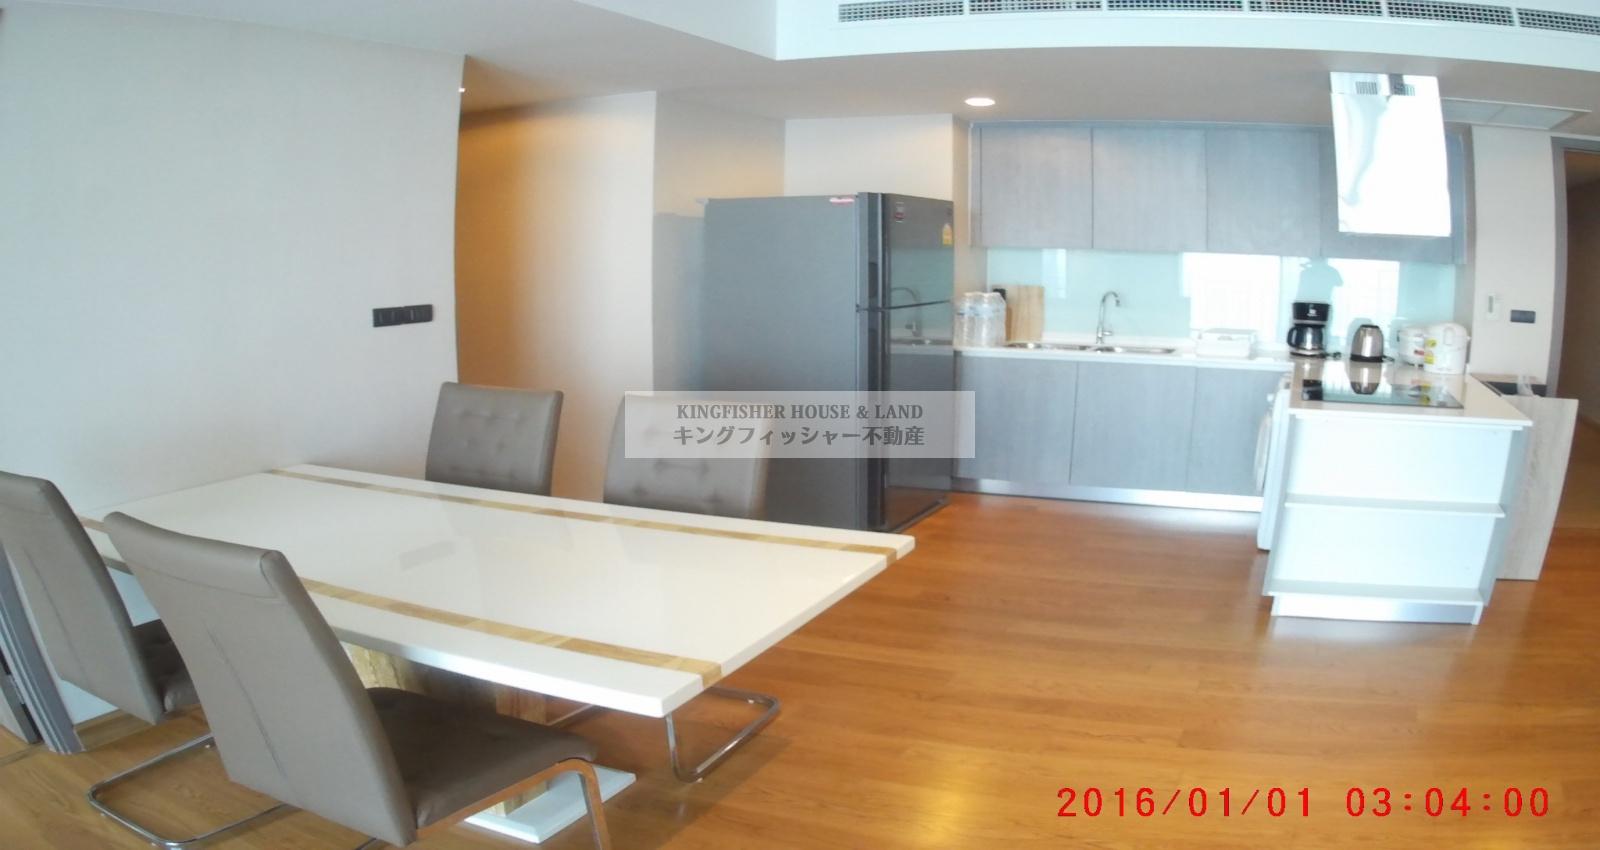 Sriracha, Thailand 20110, 2 ベッドルーム ベッドルーム, ,2 バスルームバスルーム,コンドミニアム,賃貸物件,1307